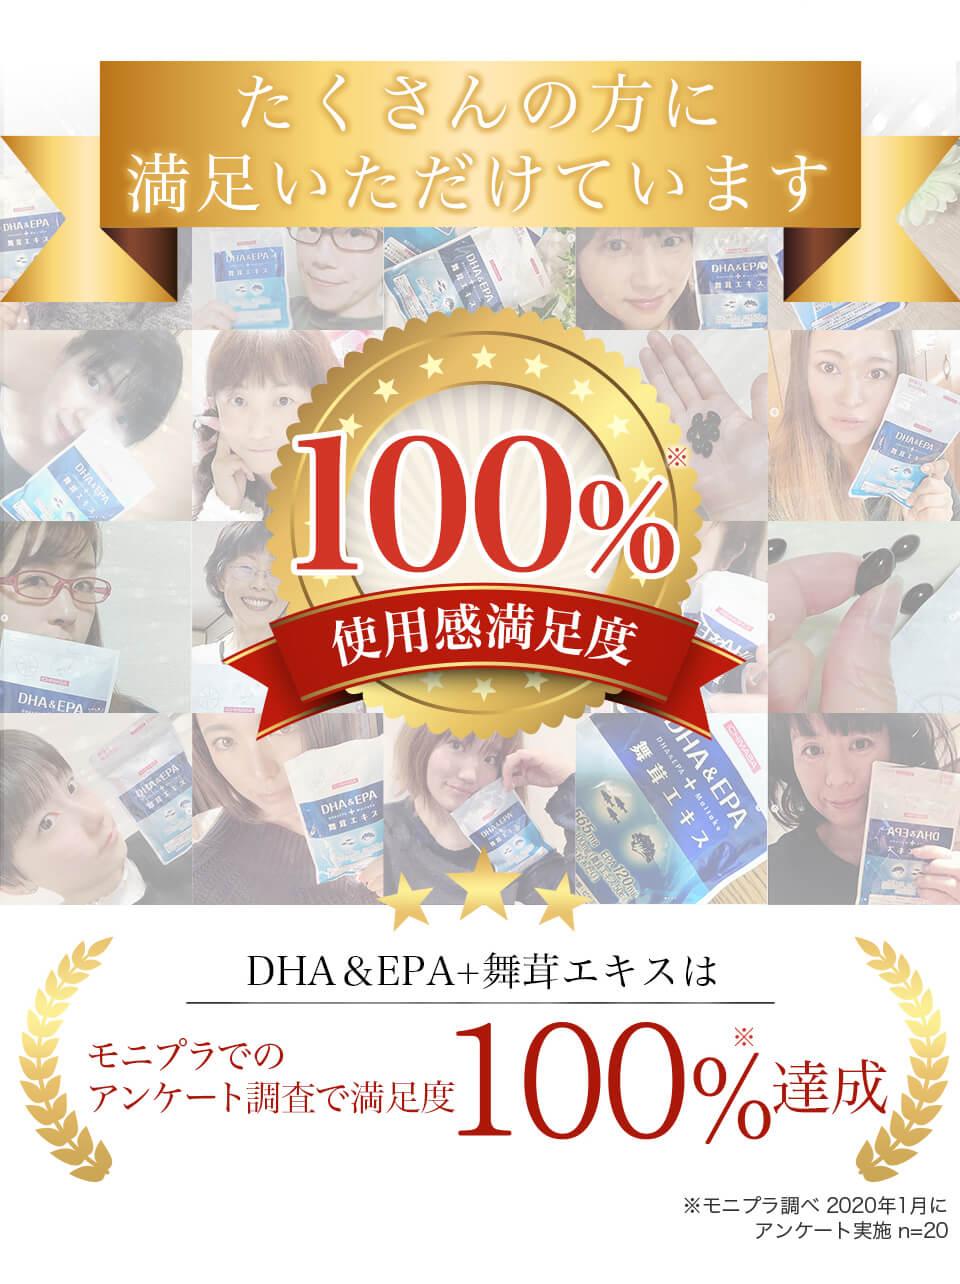 DHA&EPA+舞茸エキス サプリメント n︲3系脂肪酸 ビタミンE 厚生労働省の「日本人の食事摂取基準」DHA・EPA(オメガ3脂肪酸)は1日1,000mg 全世代で平均約550mg不足!